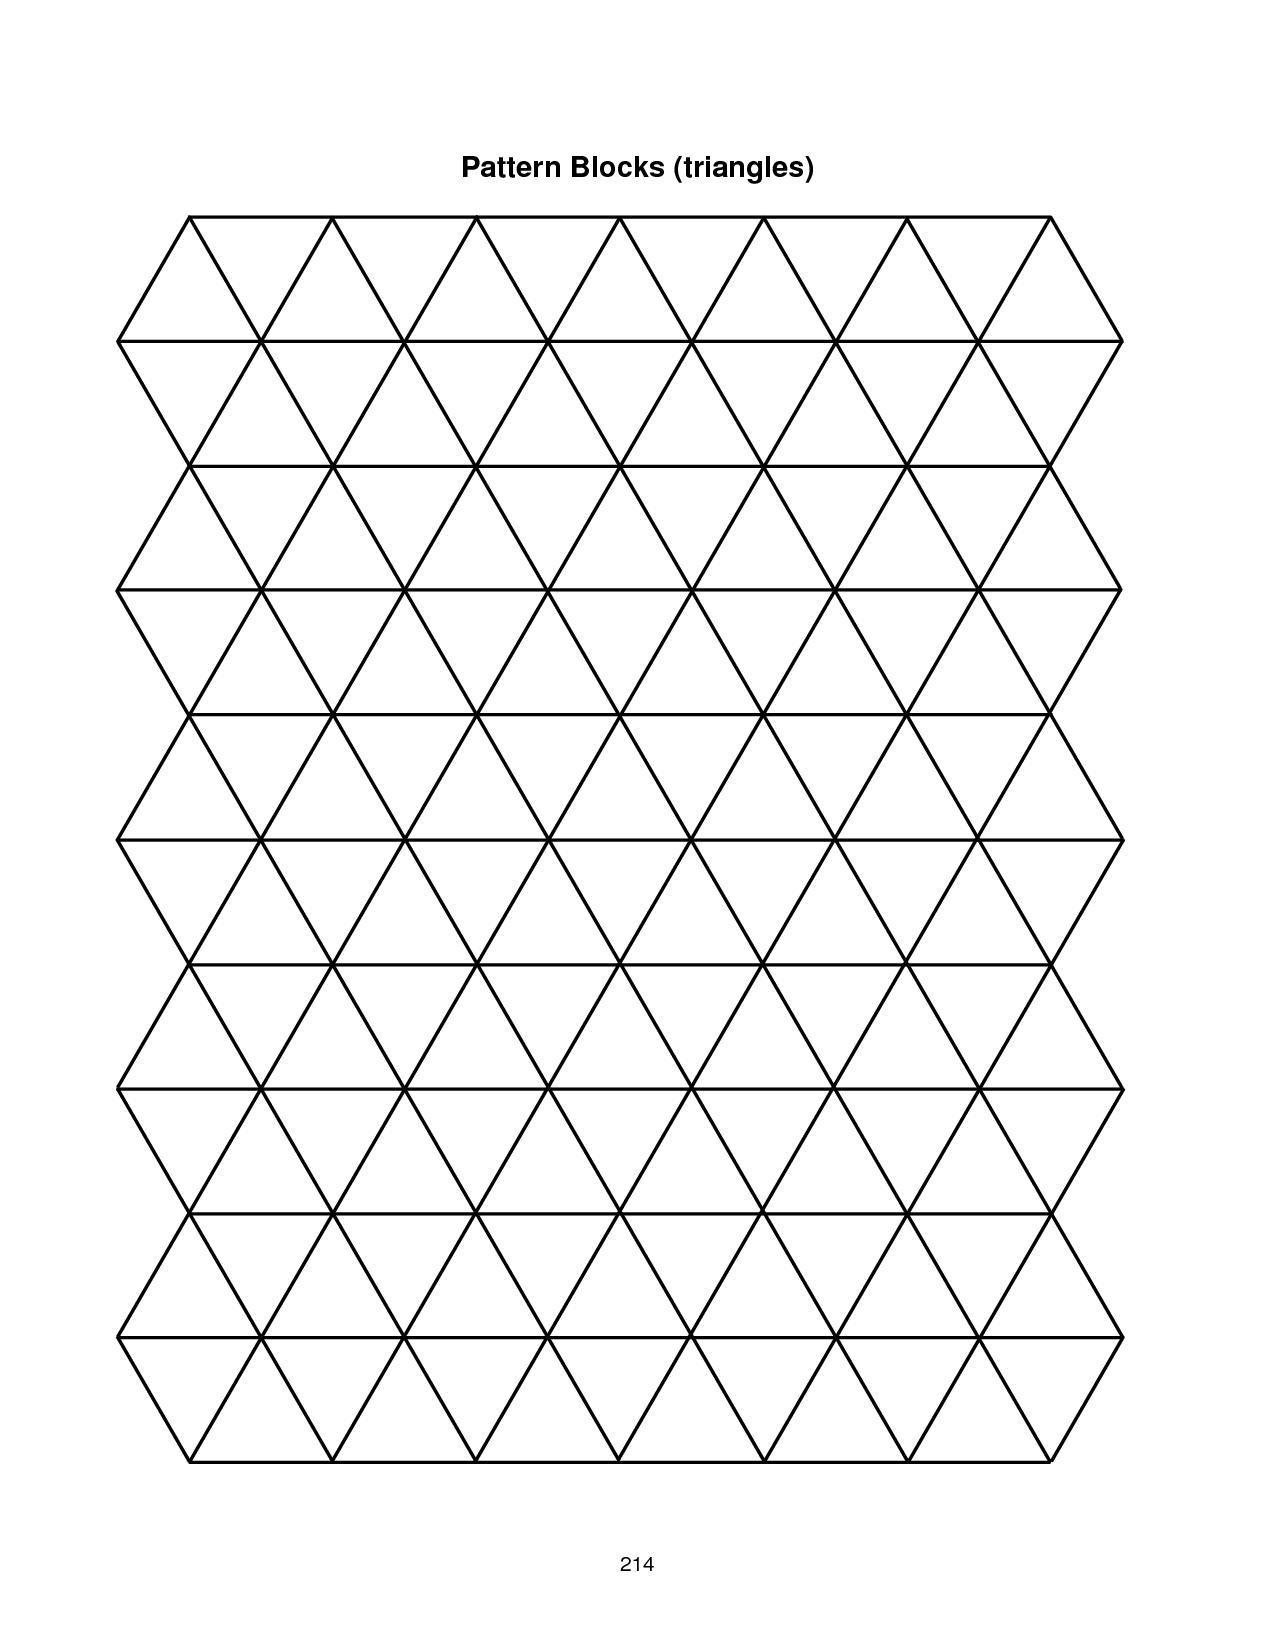 Pattern Block Template